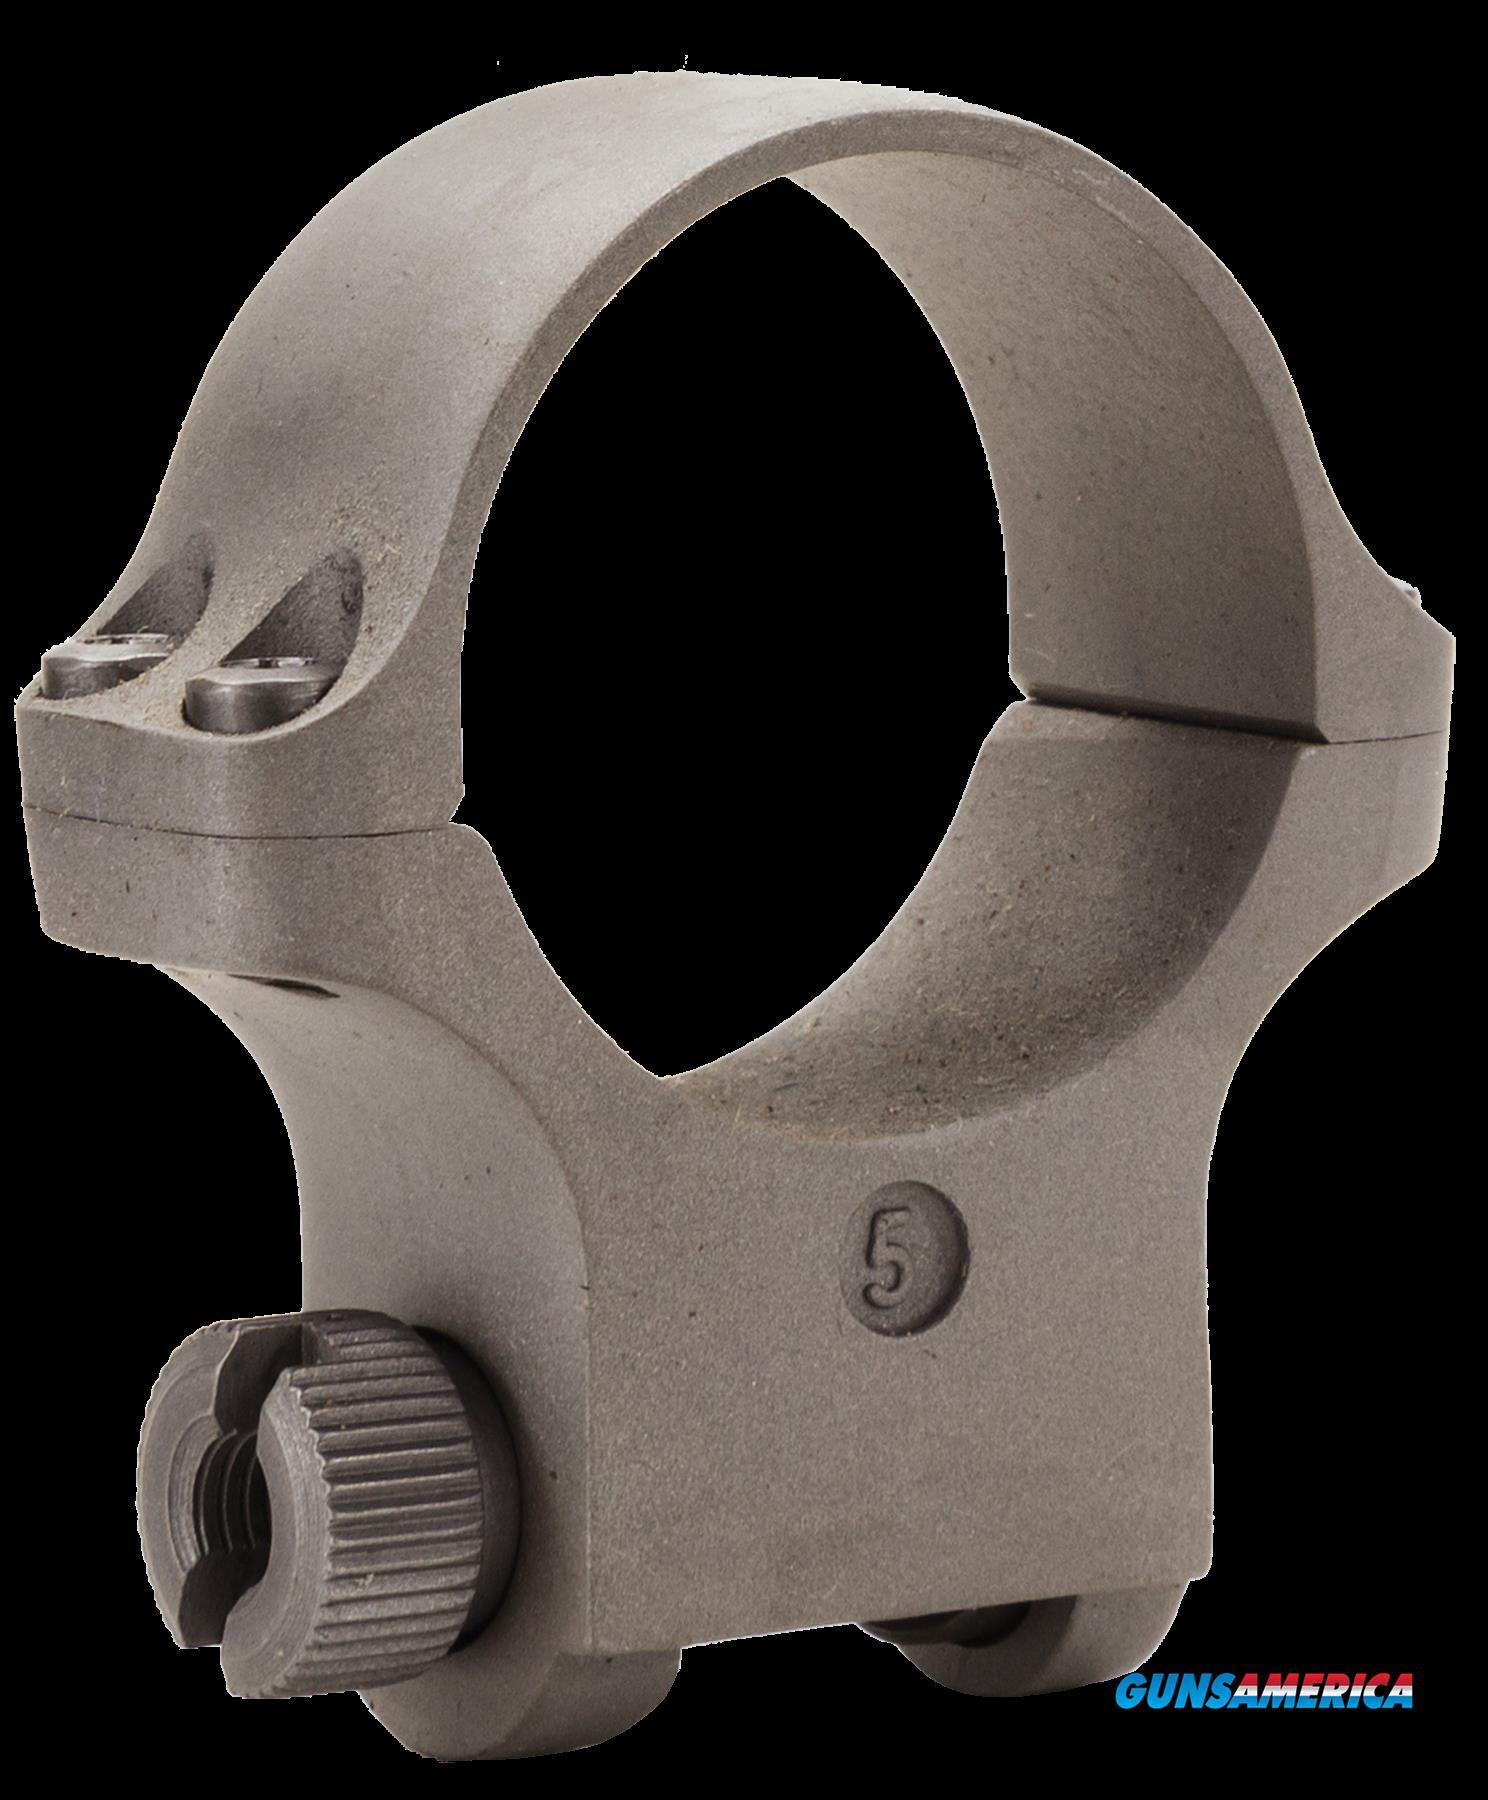 Ruger Scope Ring, Rug 90319 5k30hm 30mm Hi  Rng Mat Clam  Guns > Pistols > 1911 Pistol Copies (non-Colt)